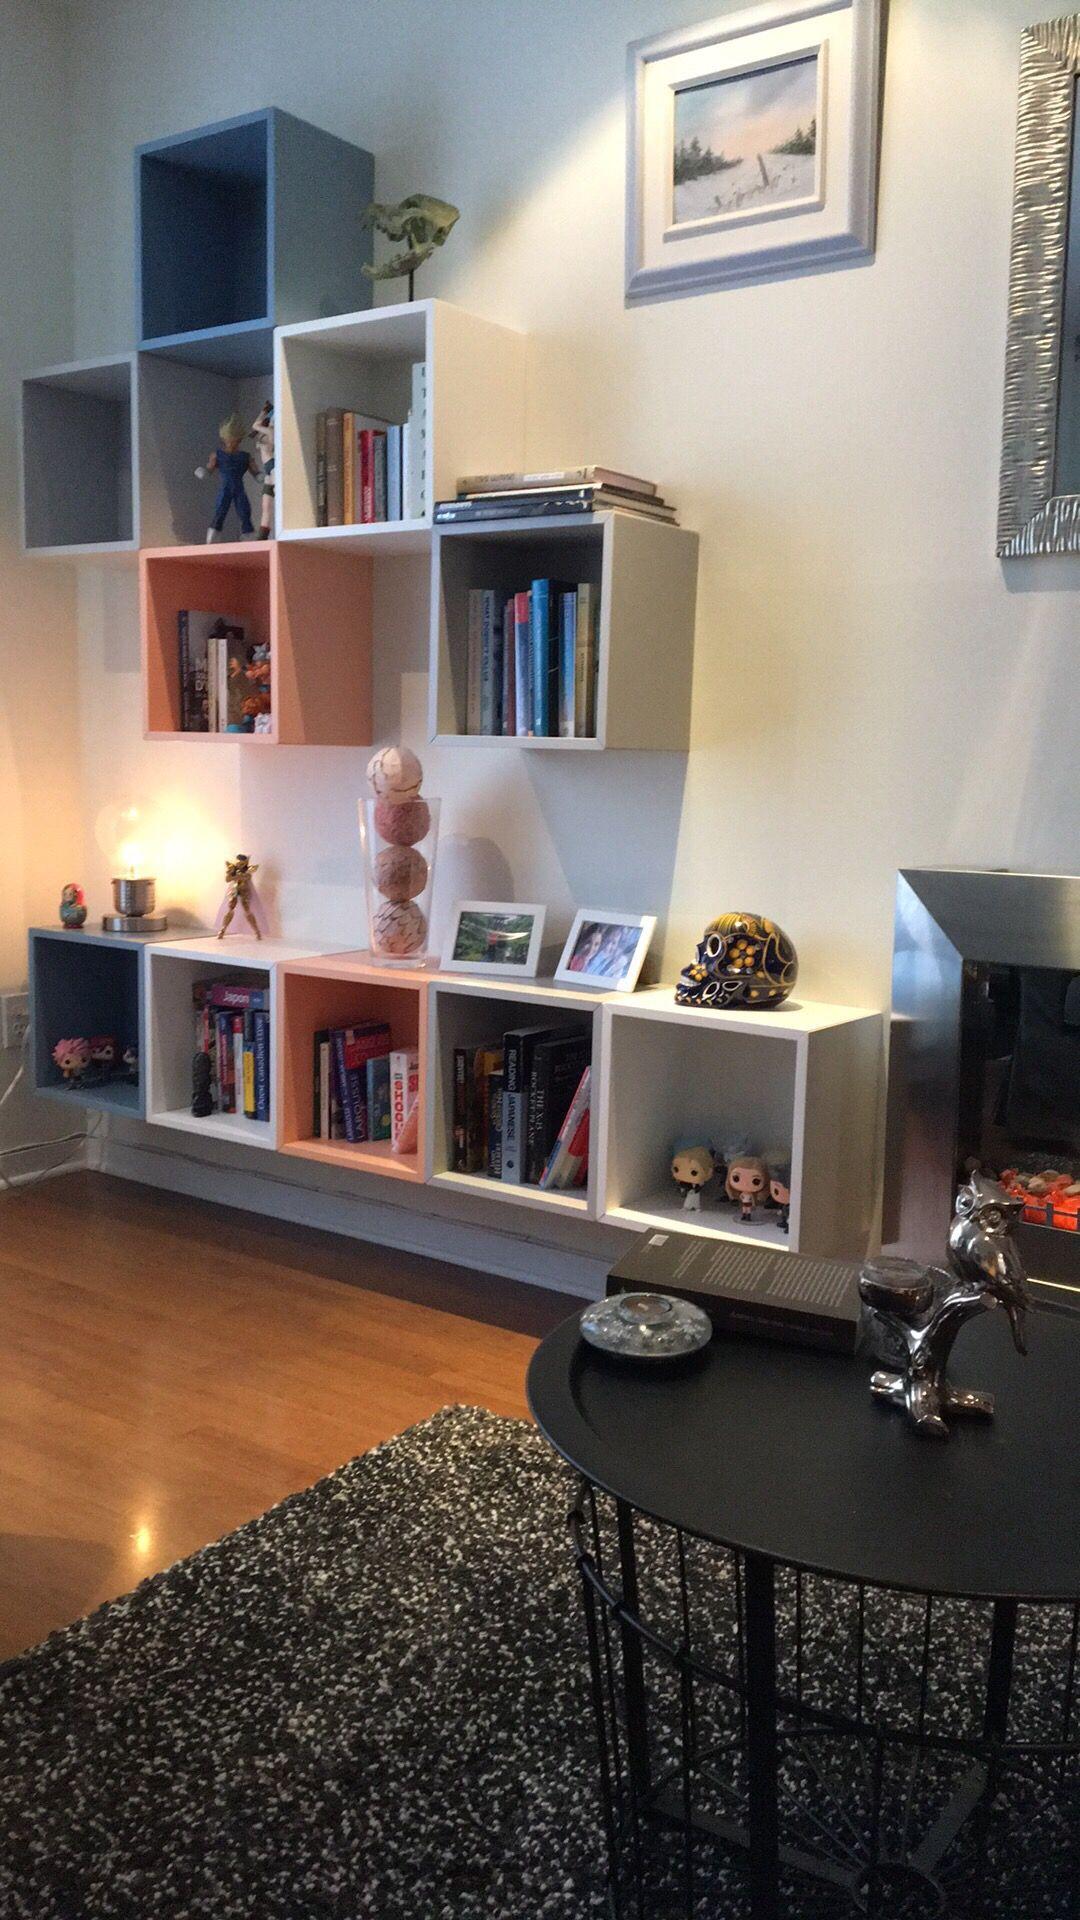 My Ikea eket | Idee di arredamento, Arredamento di design ...